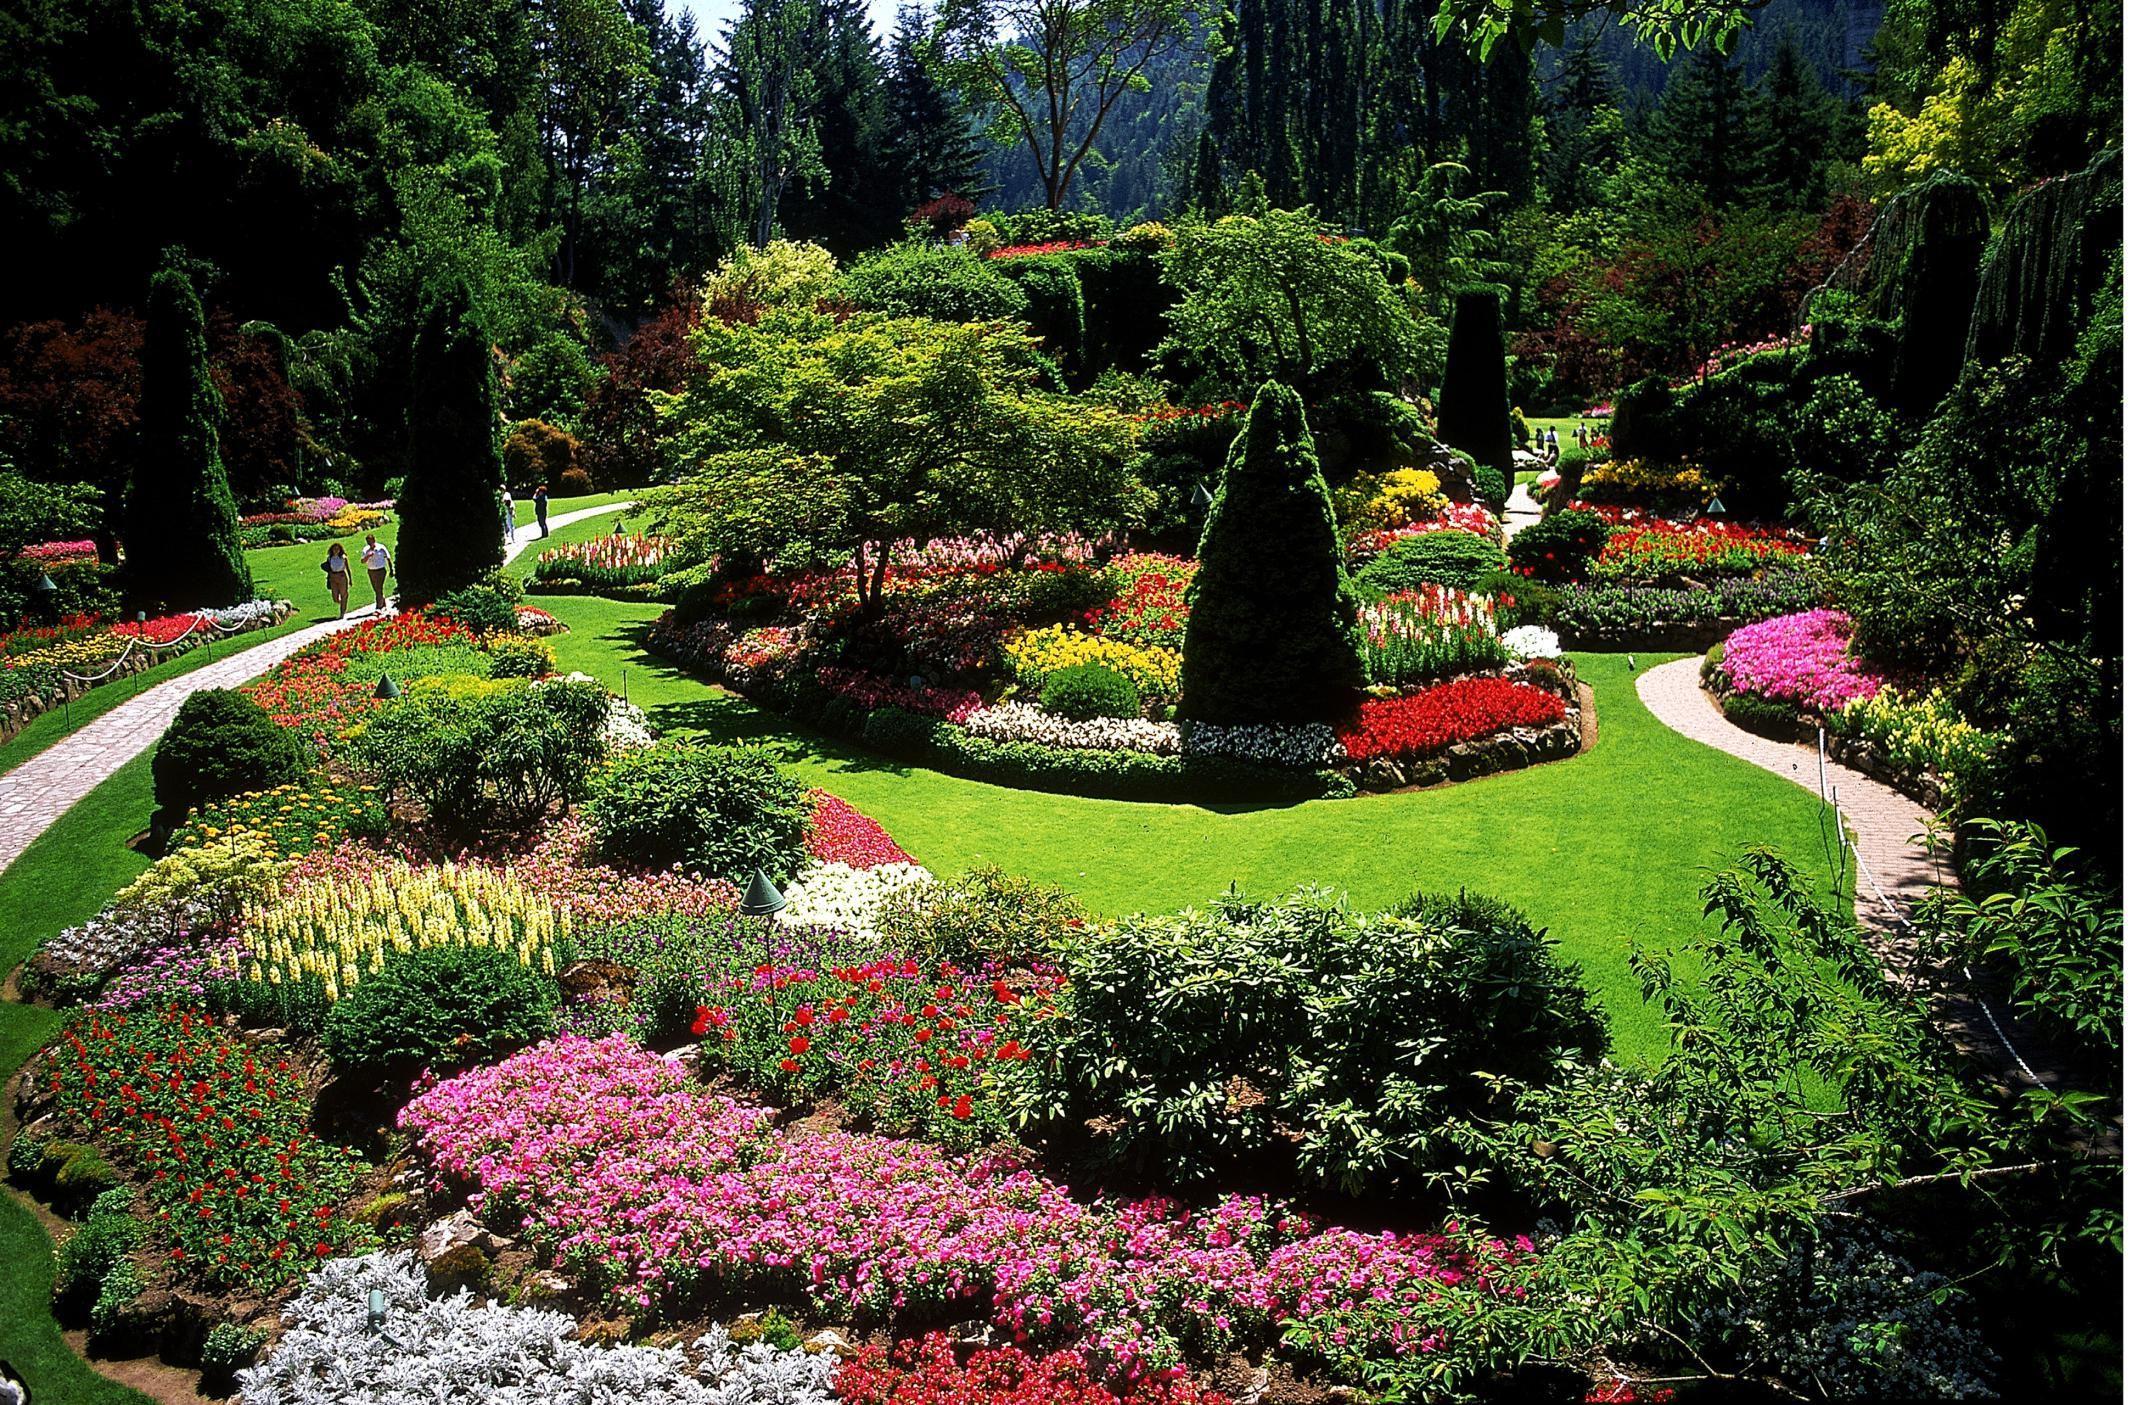 Designing A Garden With Landscape Design Principles Best Garden Design Best Garden Ideas Diy Garden Gard Landscape Design Backyard Landscaping Garden Design